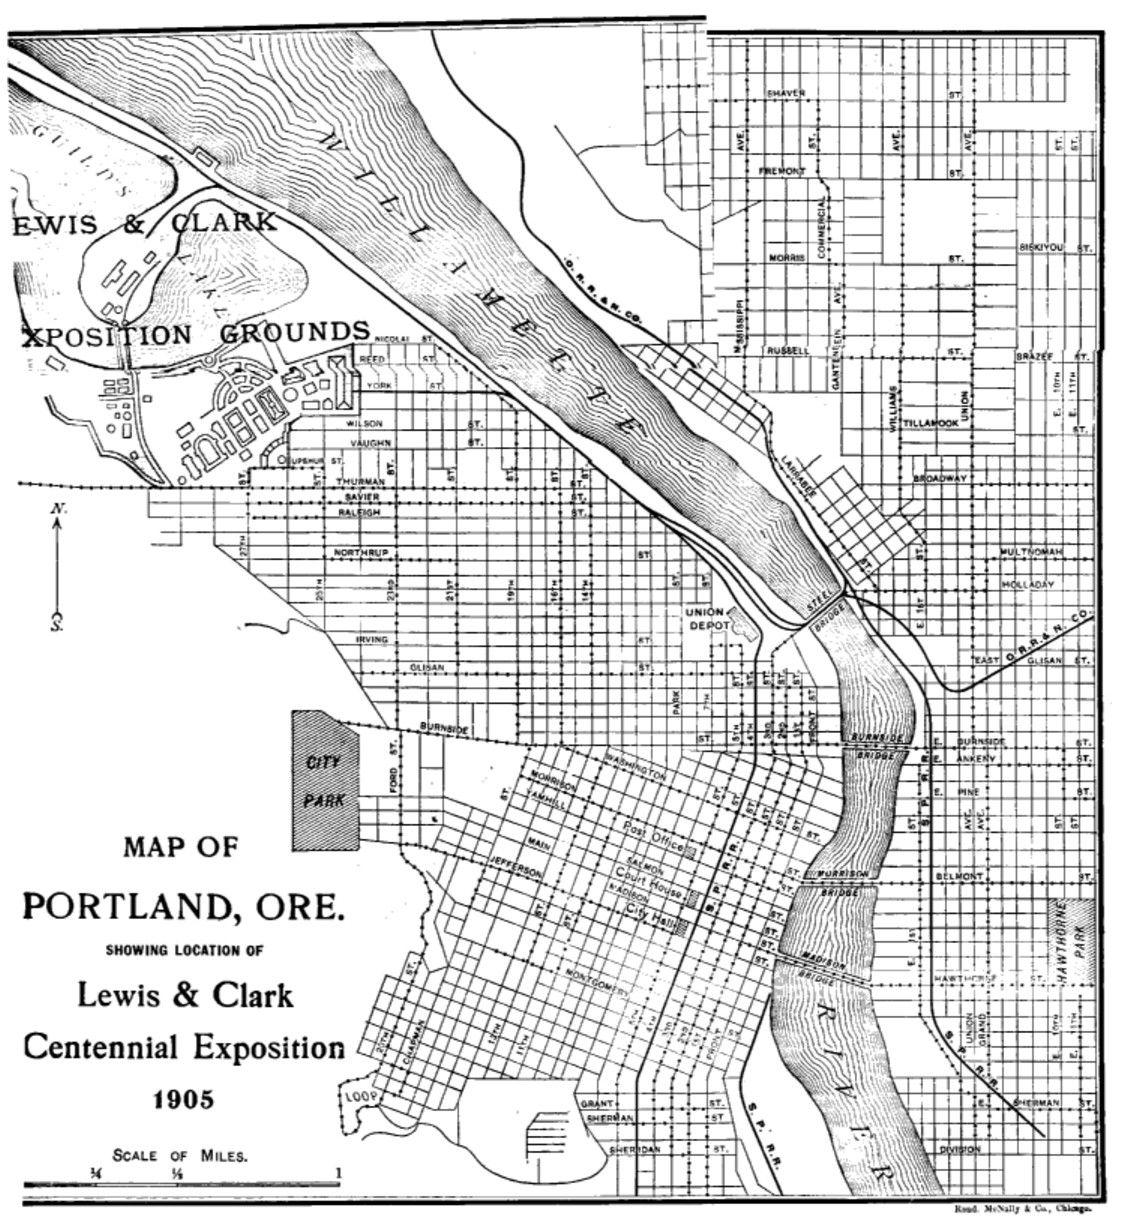 Map of downtown portland oregon portland oregon map see map map of downtown portland oregon portland oregon map see map details from rootsweb aiddatafo Choice Image